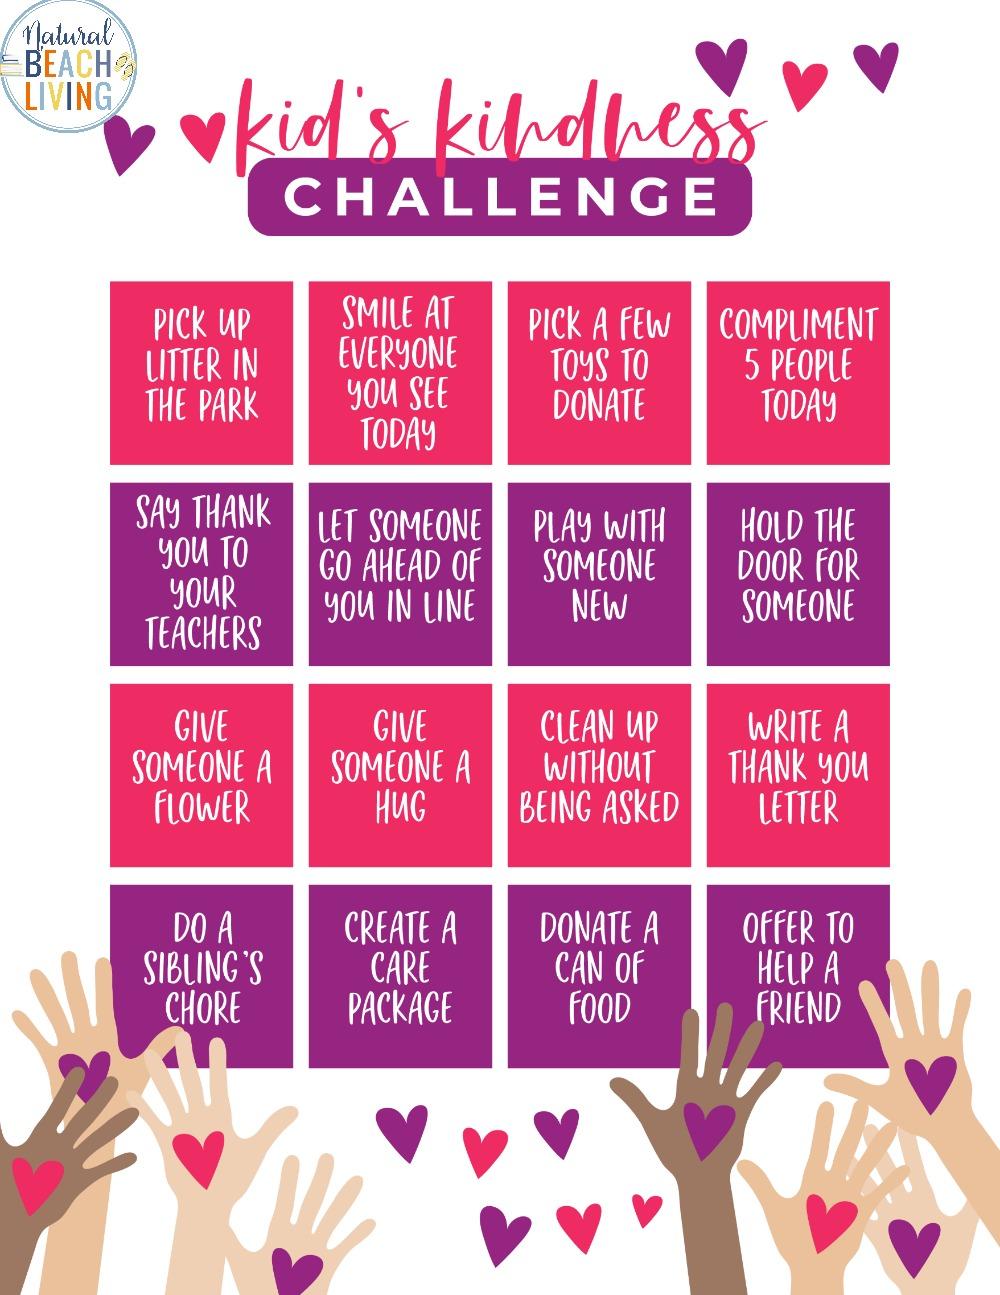 Kindness Challenge for Kids – Free Kindness Printable